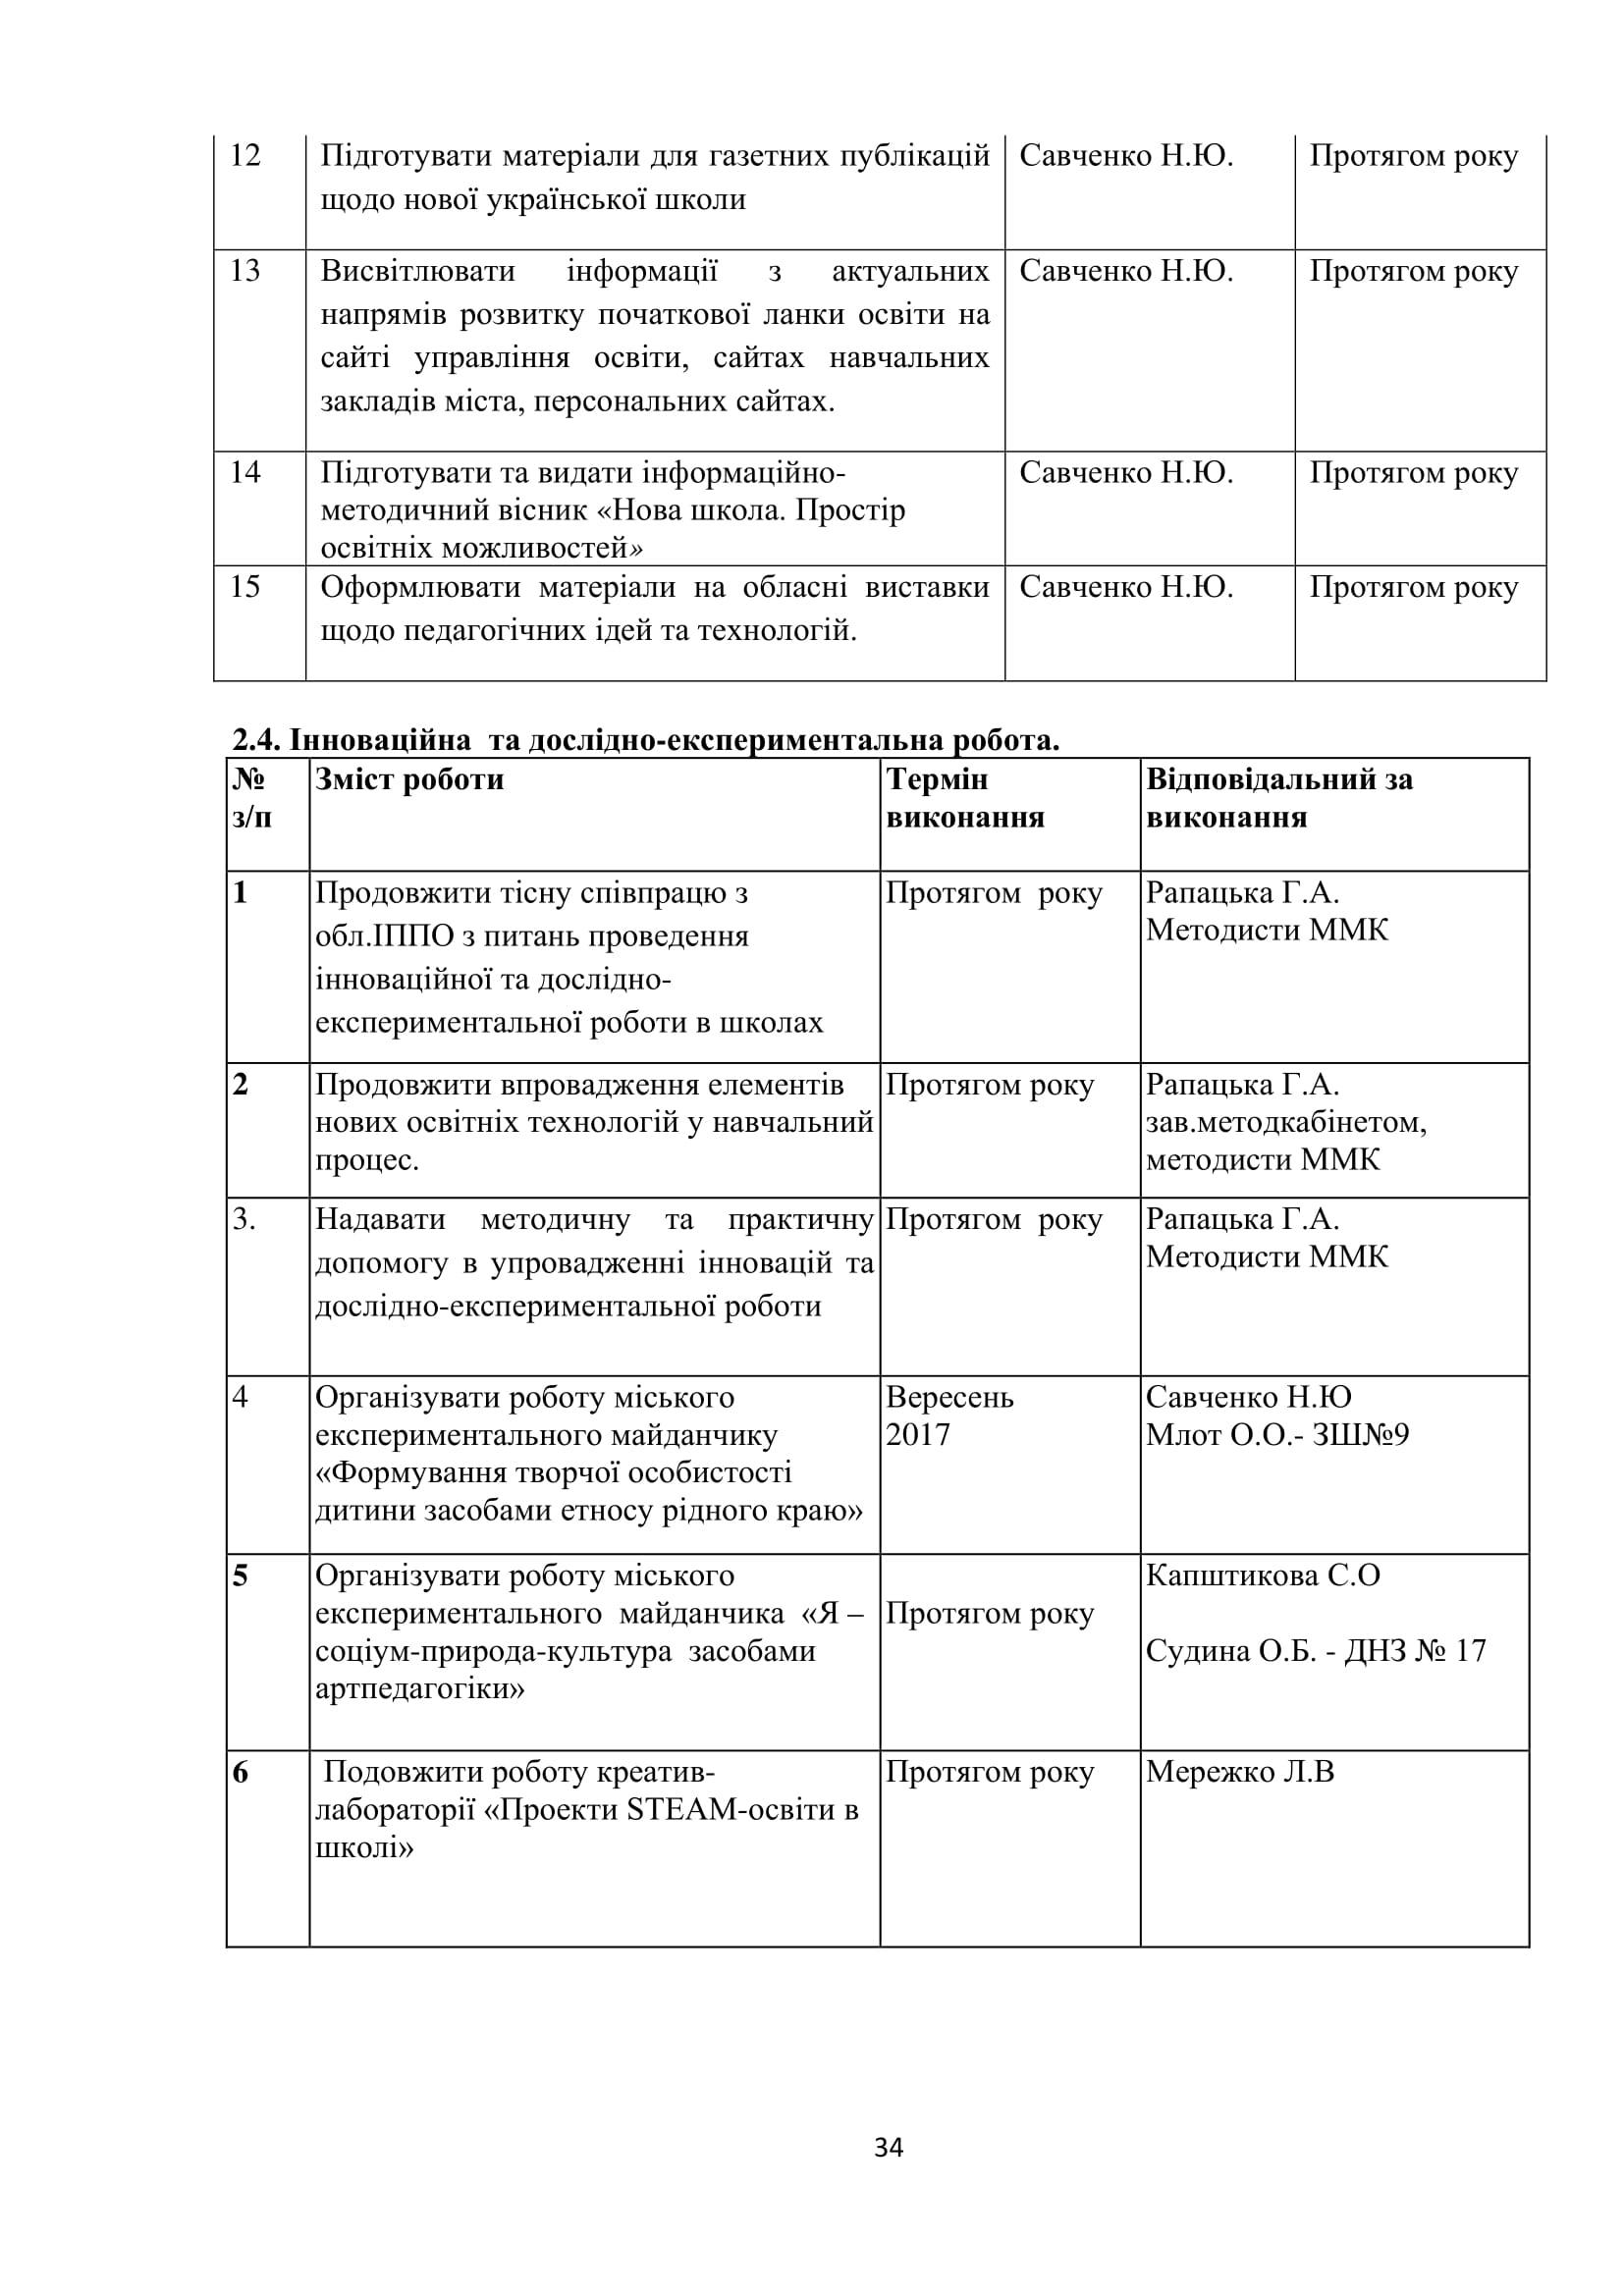 2017-2018 - ММК план роботи-35